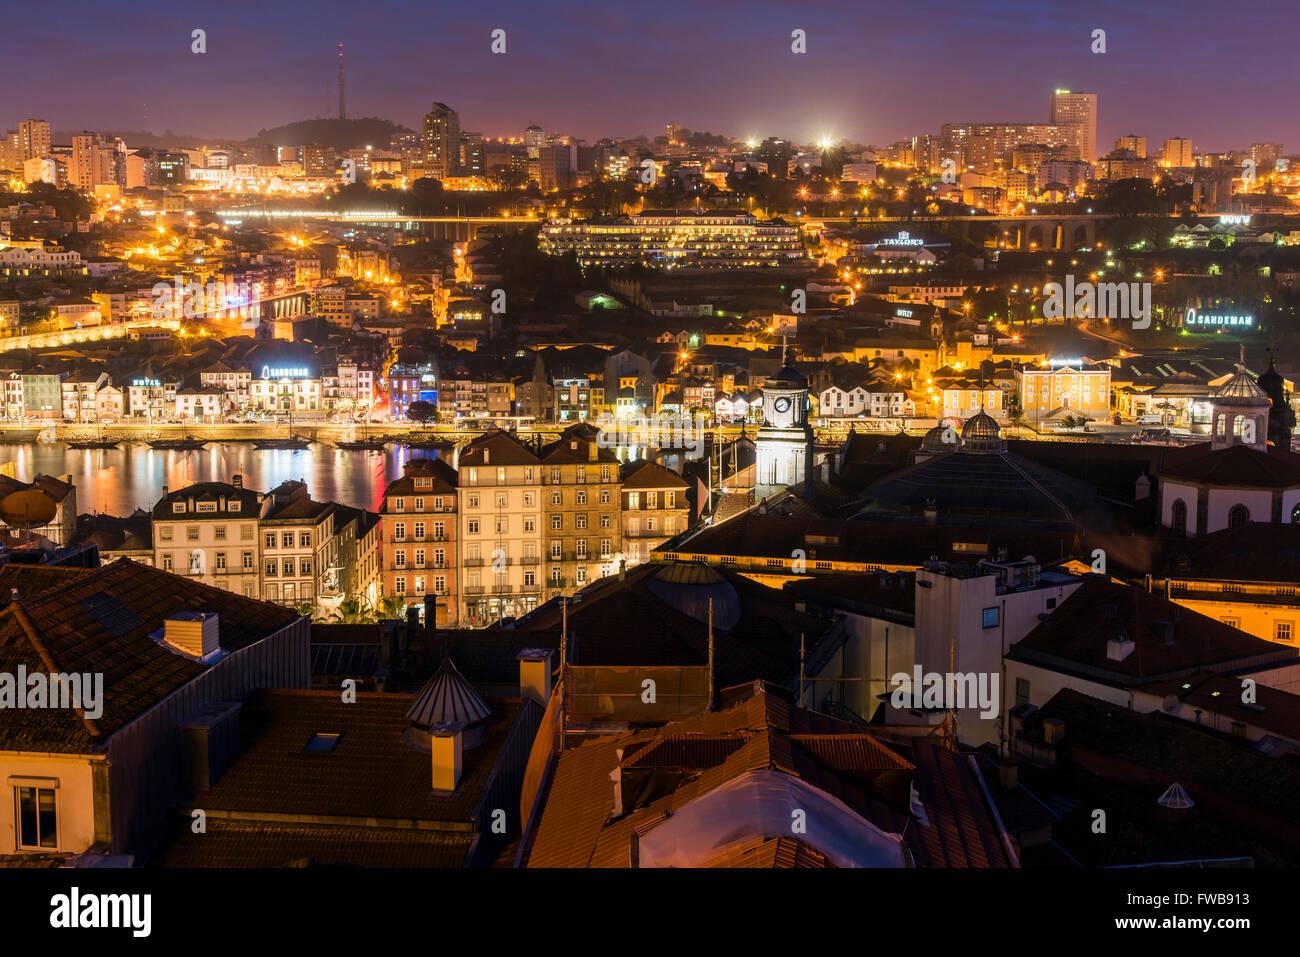 Night city skyline with Douro river and Vila Nova de Gaia district, Porto, Portugal - Stock Image